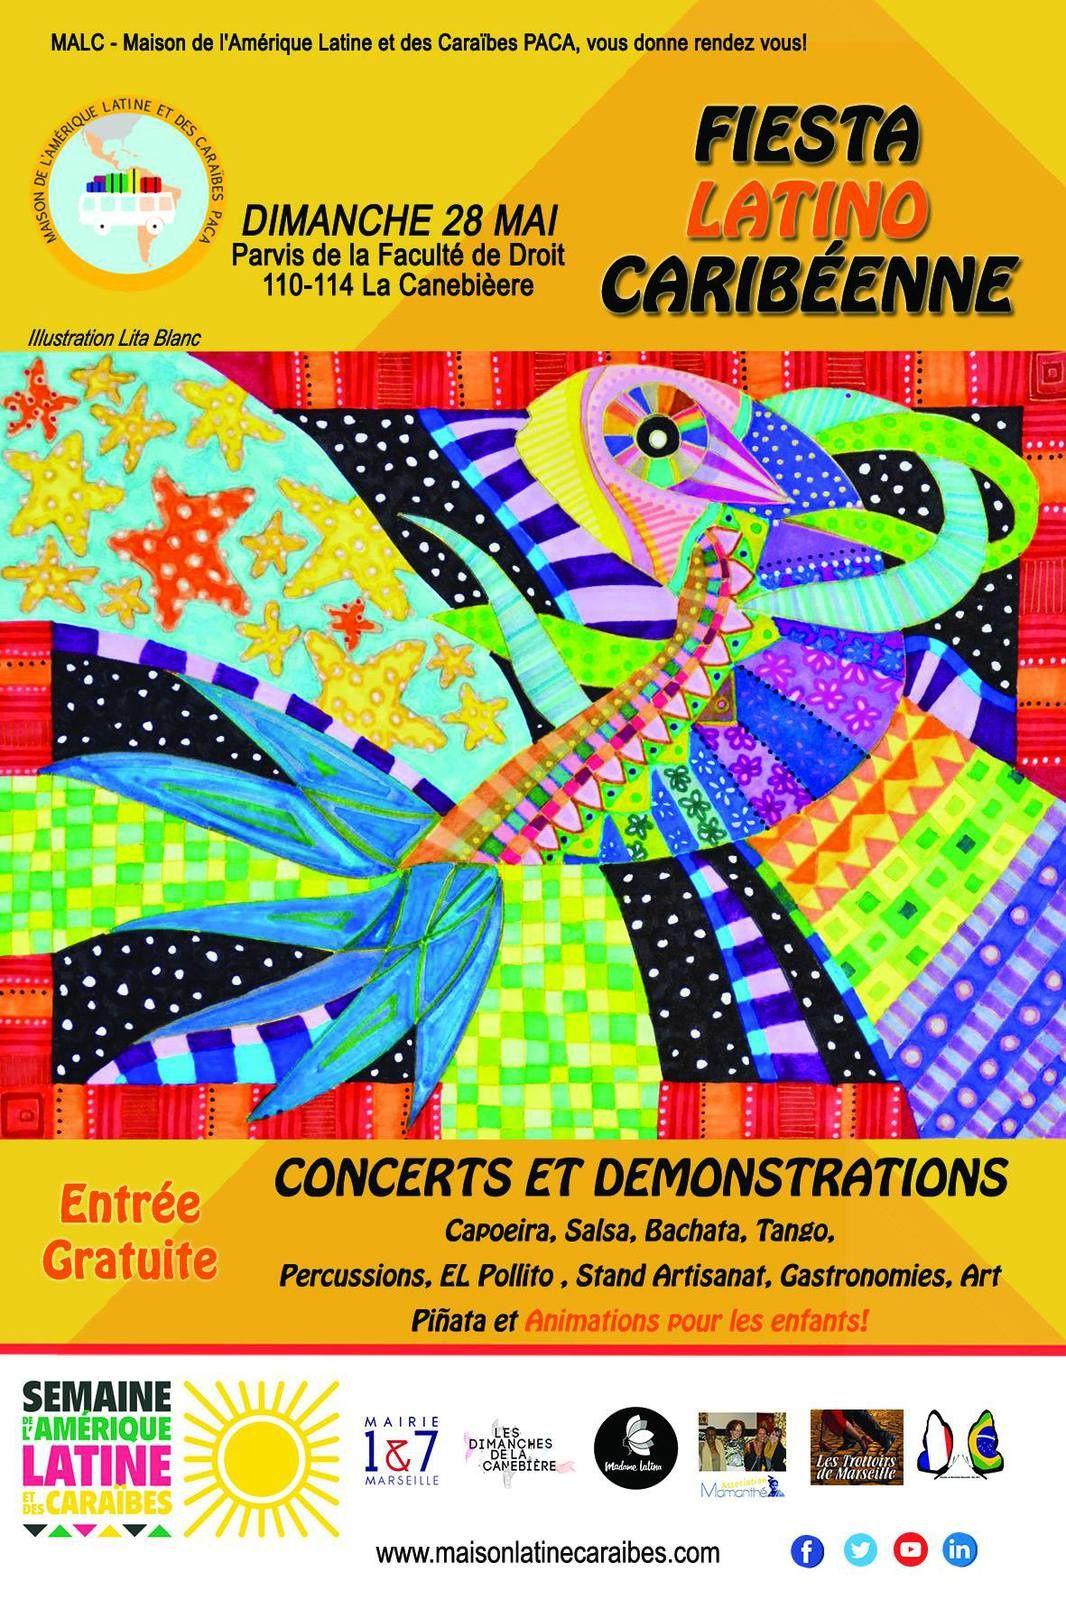 28/05/17 - Fiesta Latino-caribéenne - Marseille